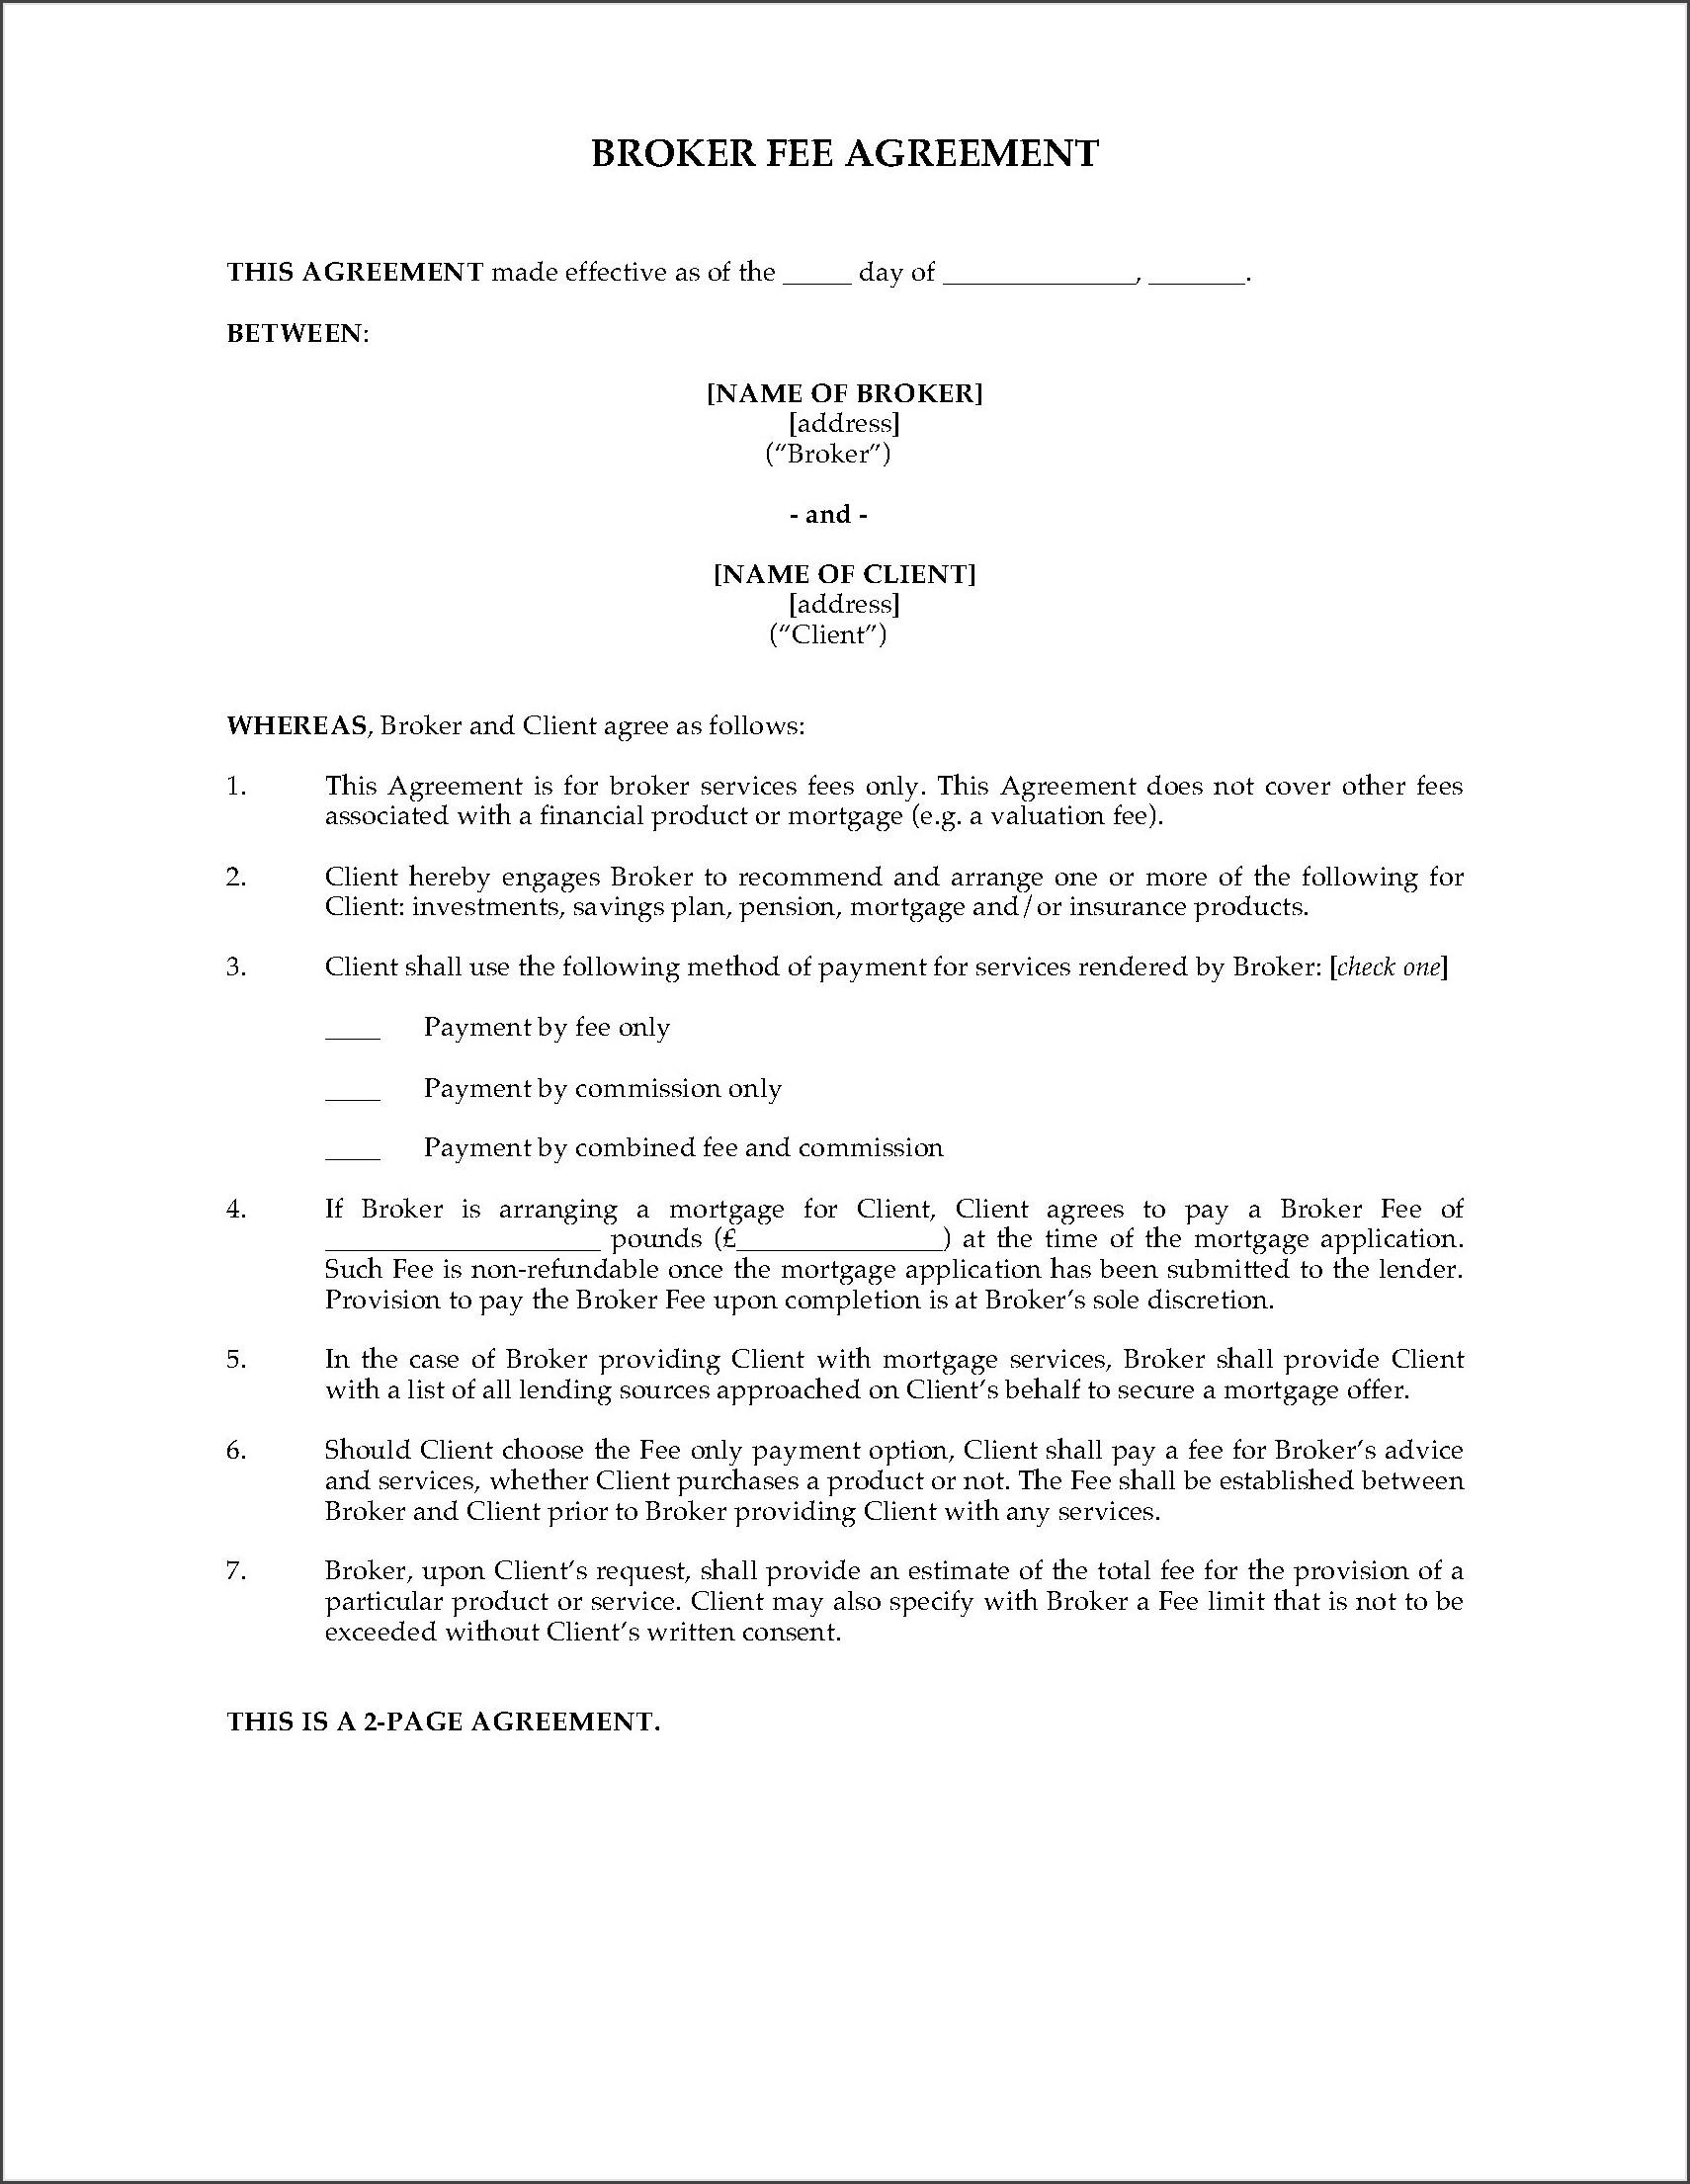 Broker Fee Agreement Template